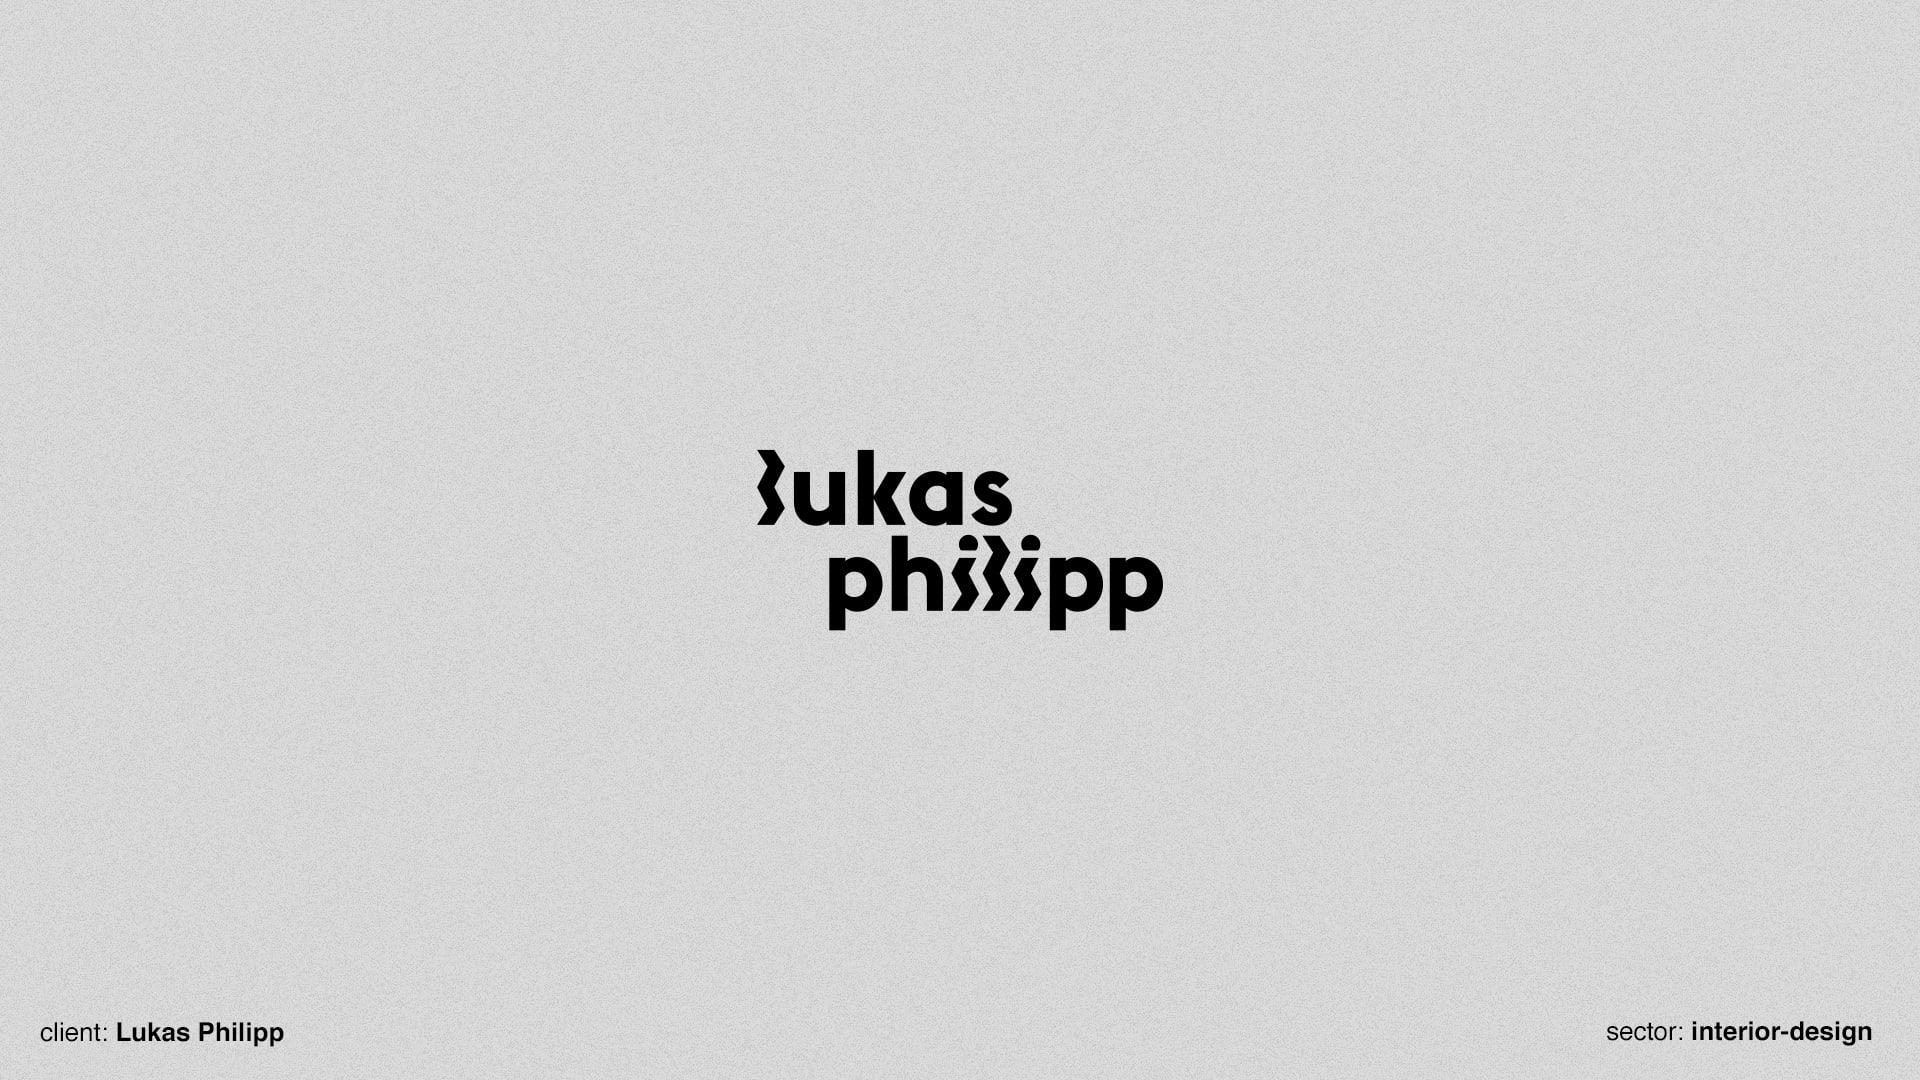 014-lukasphilipp